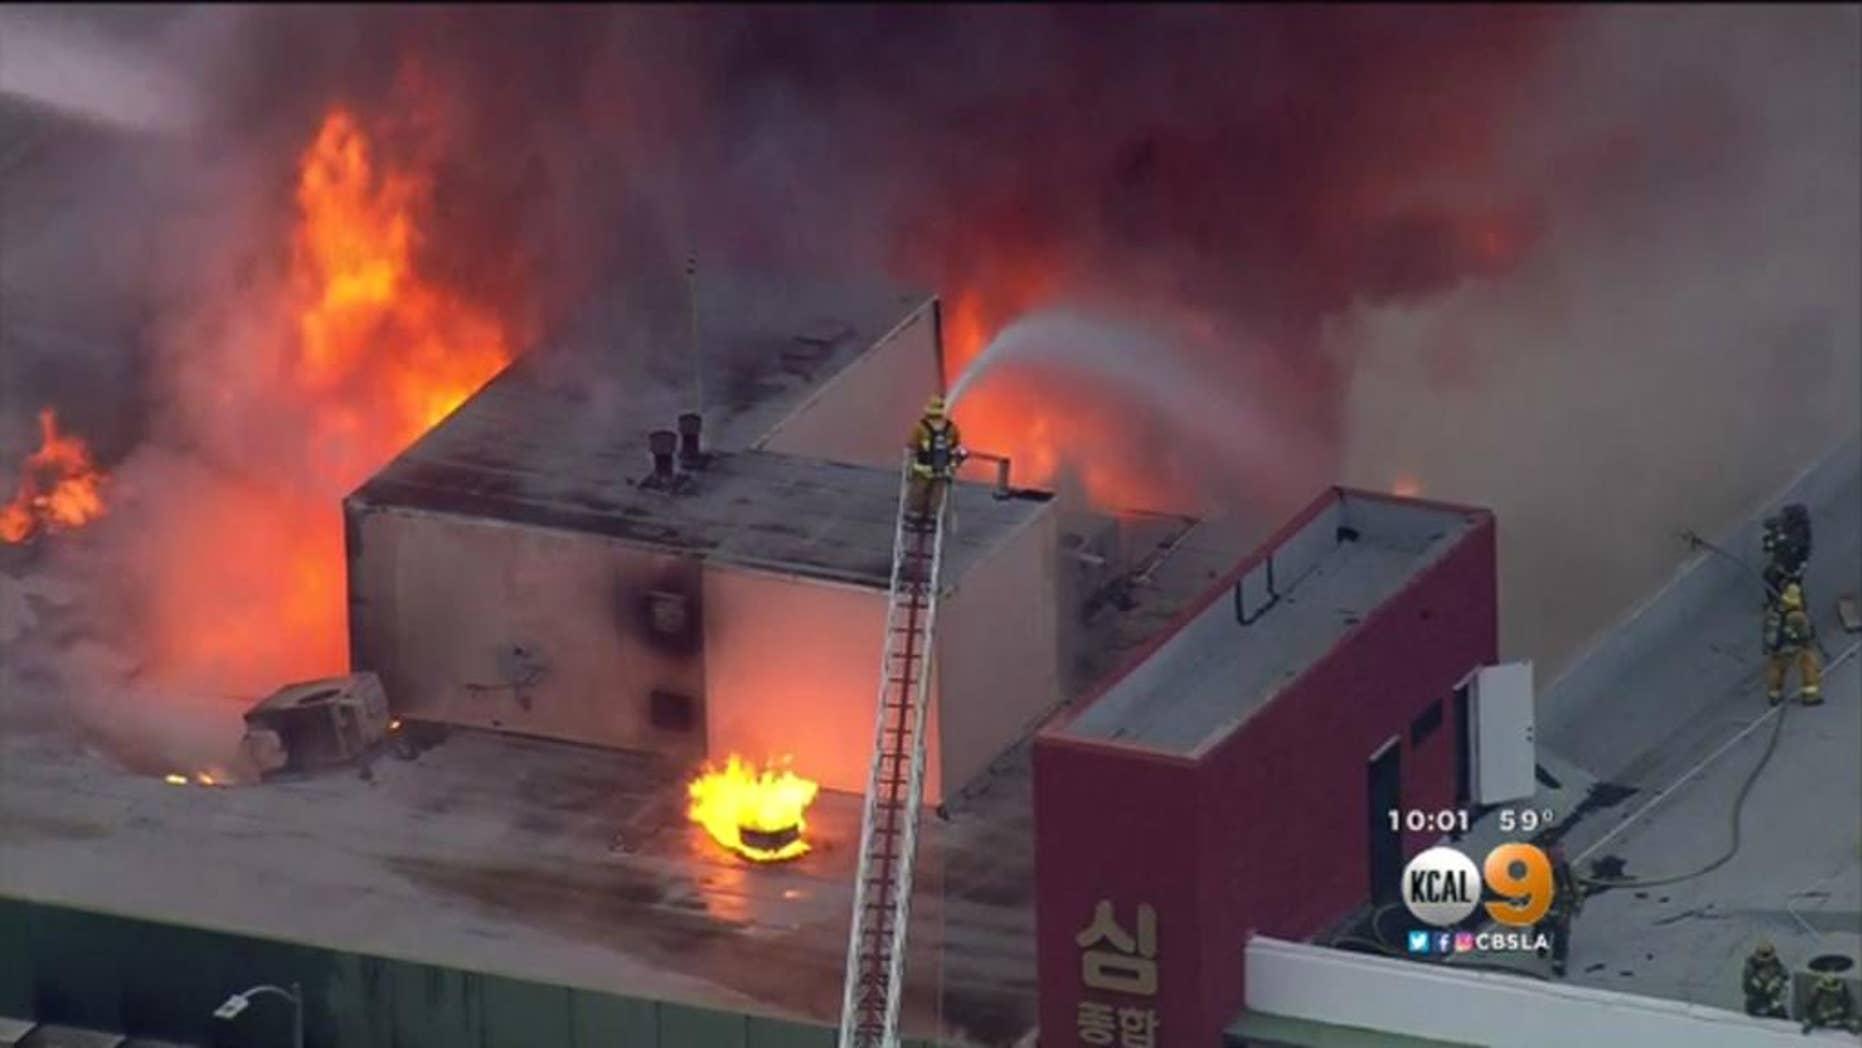 Firefighters battling the blaze on Monday.